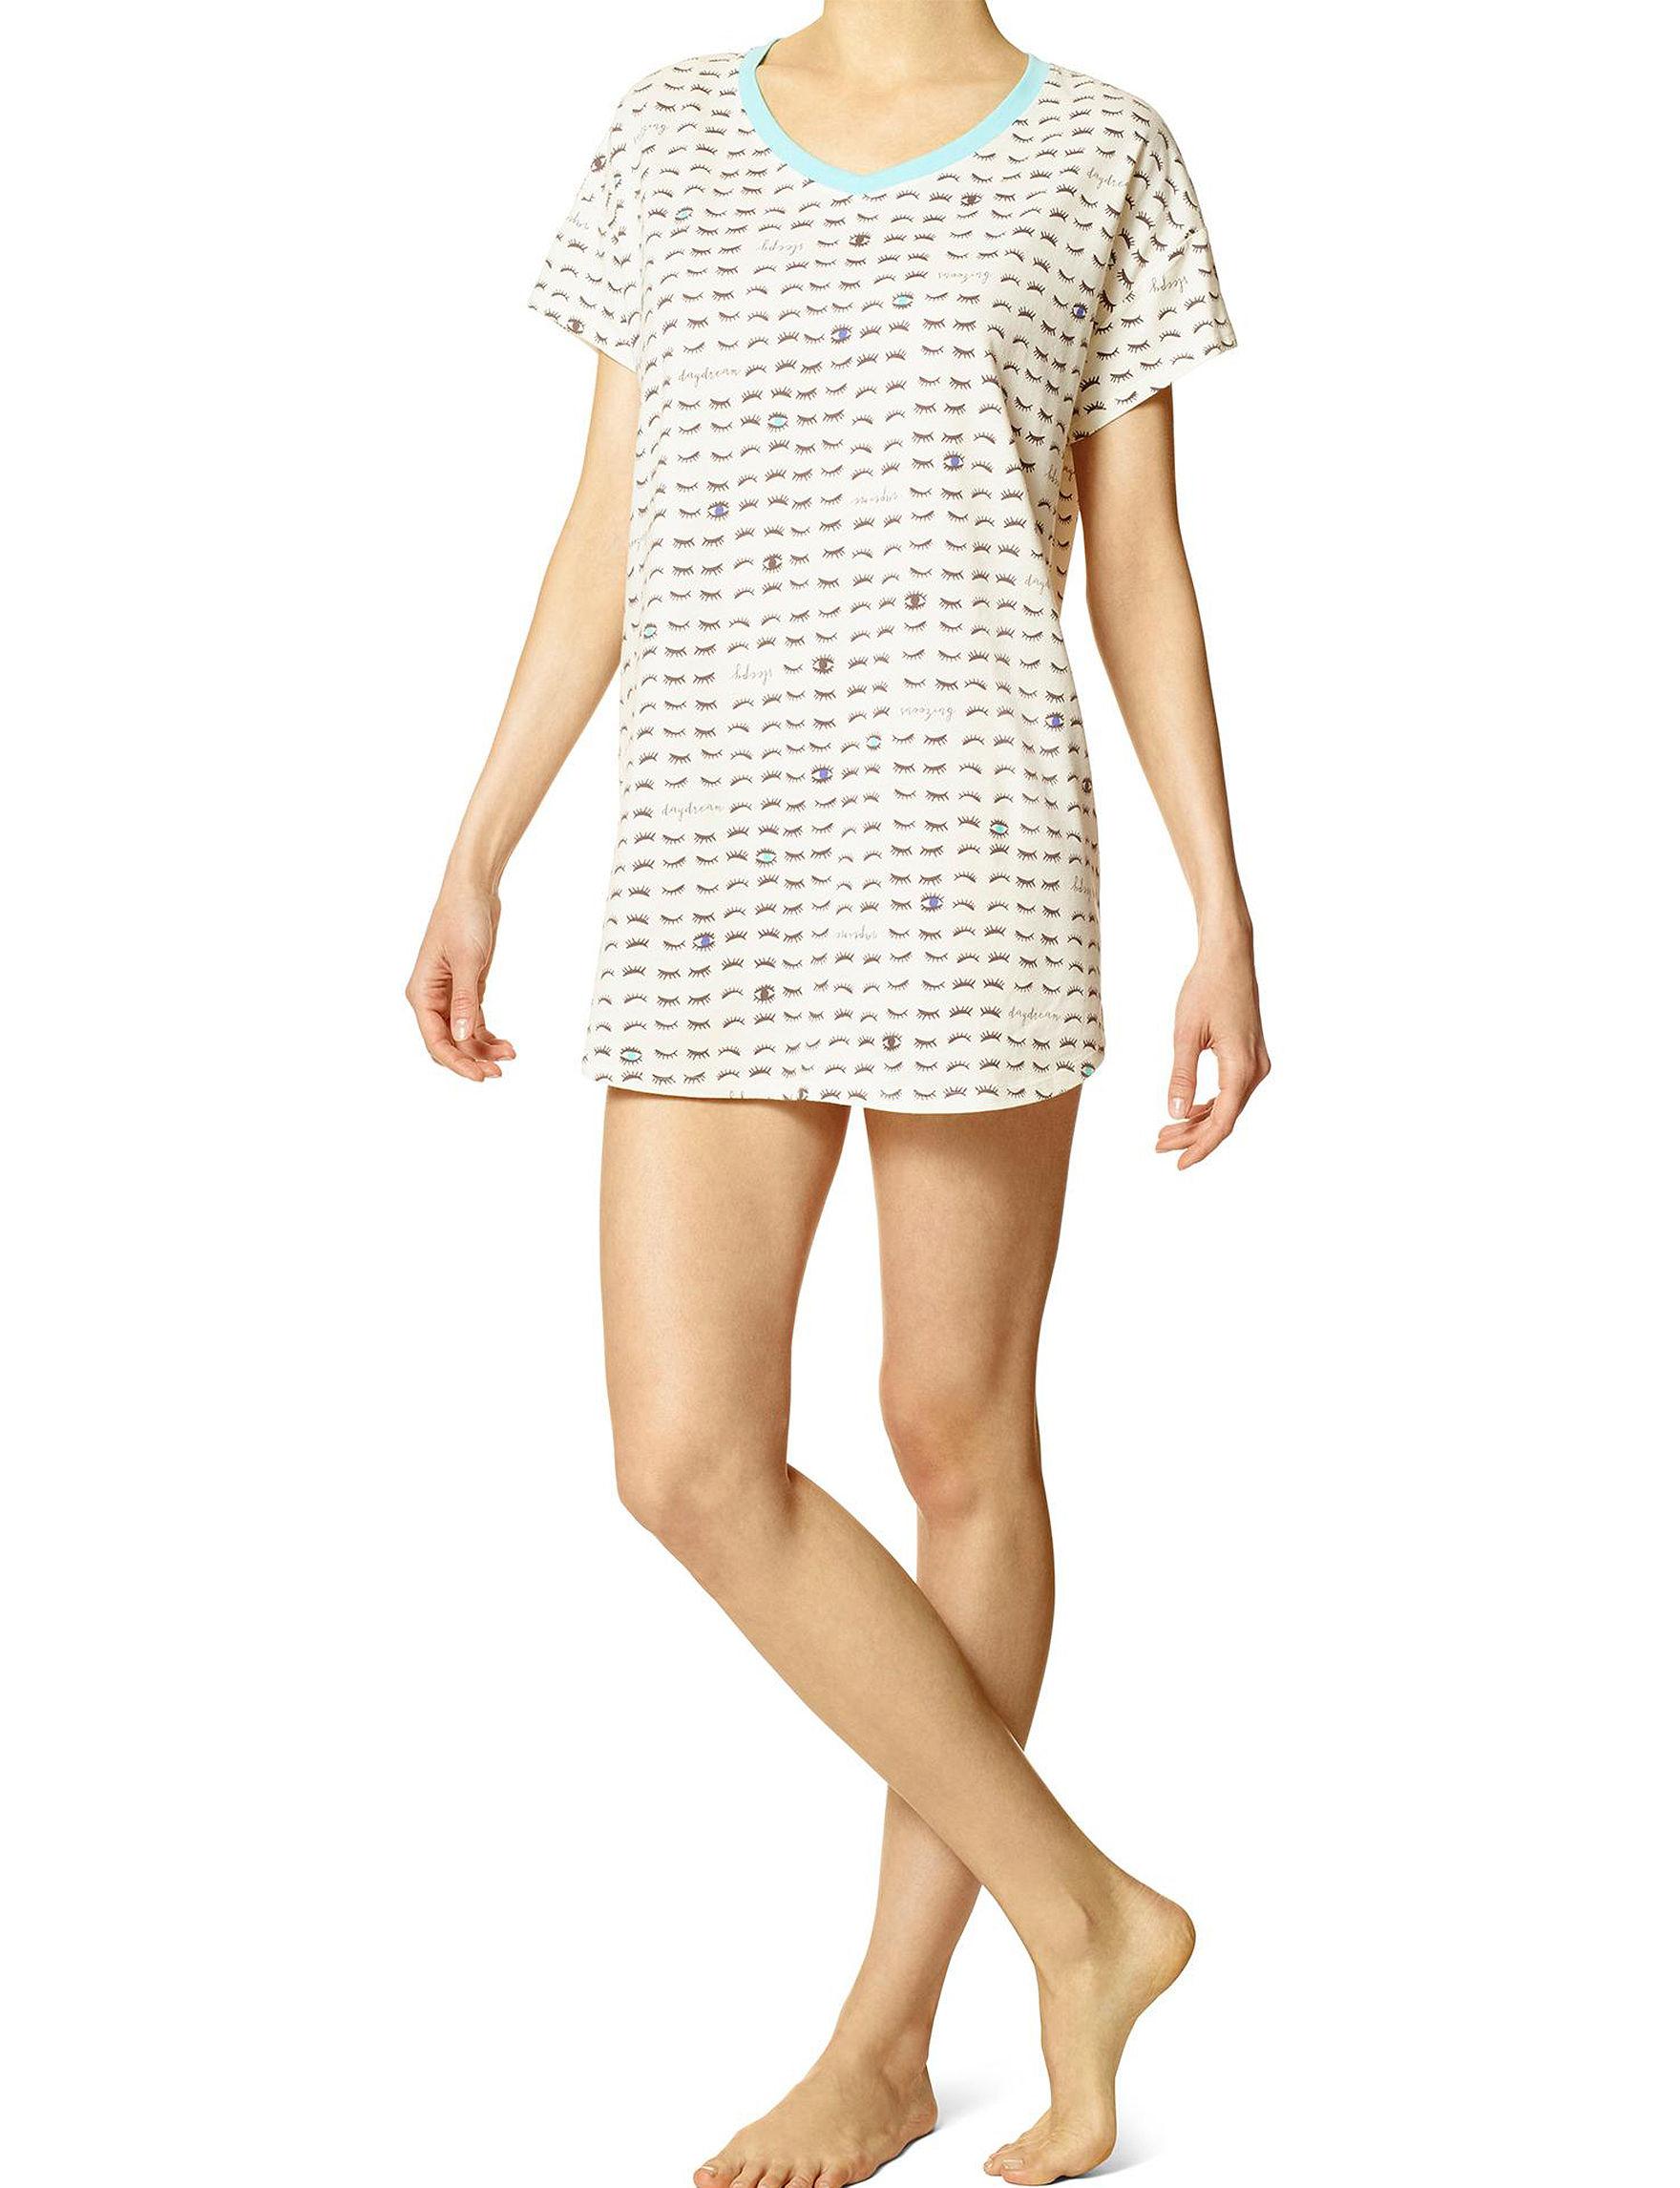 Hue Off White Nightgowns & Sleep Shirts